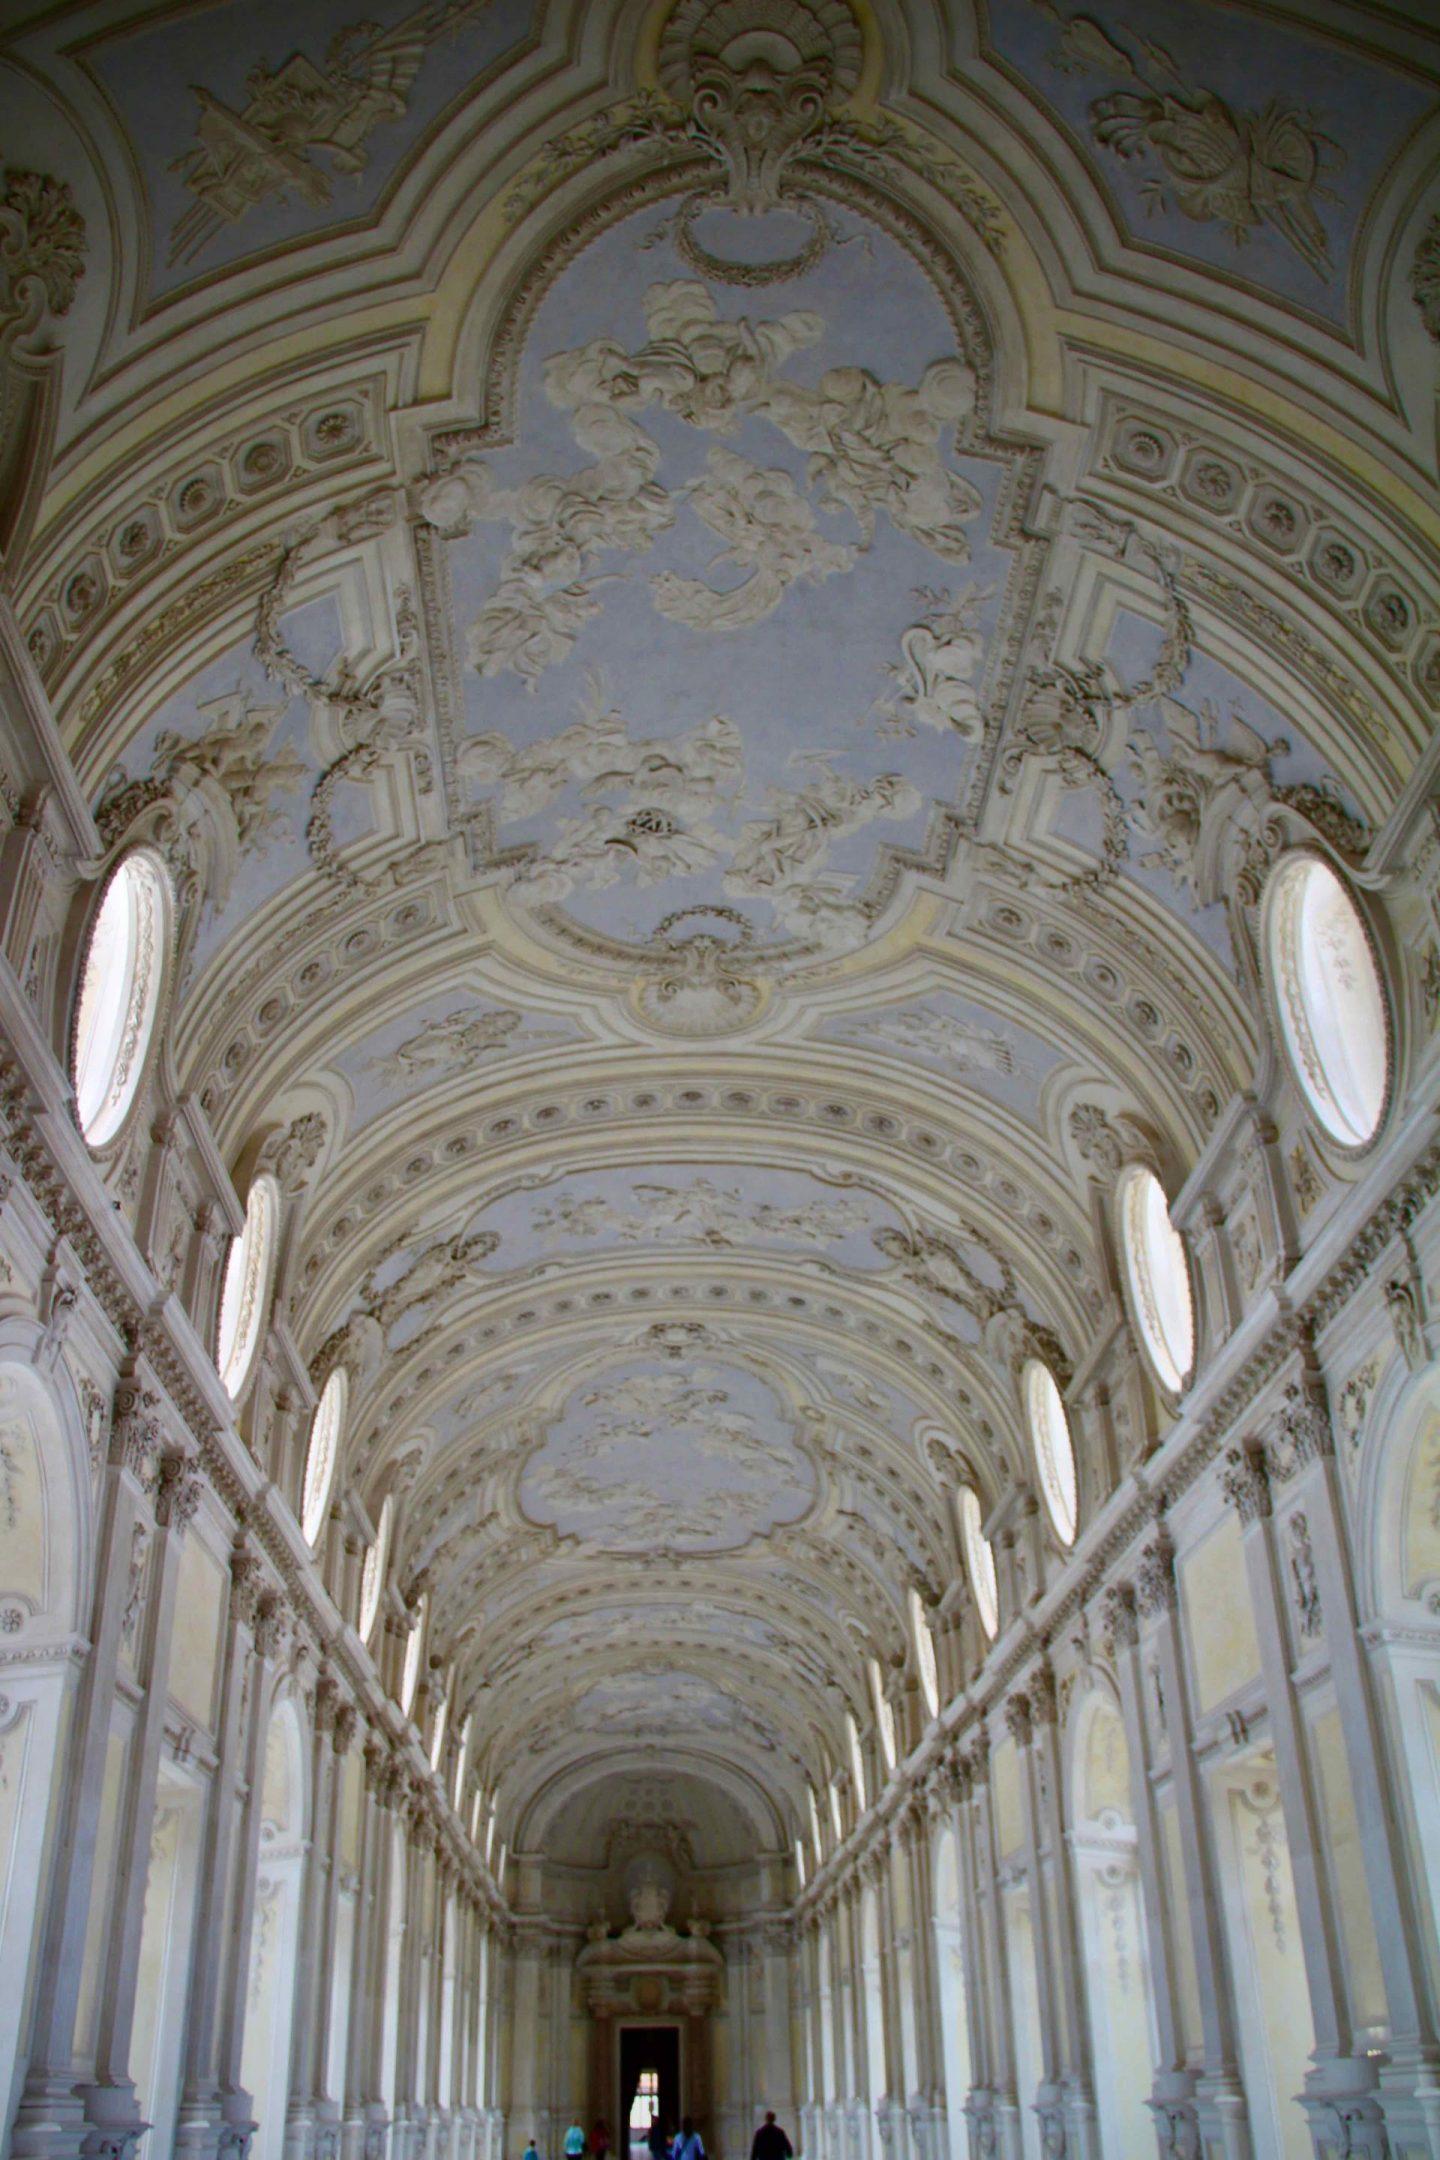 Venaria Reale Torino Italy | 7-day Torino Italy Travel Itinerary | The Spectacular Adventurer